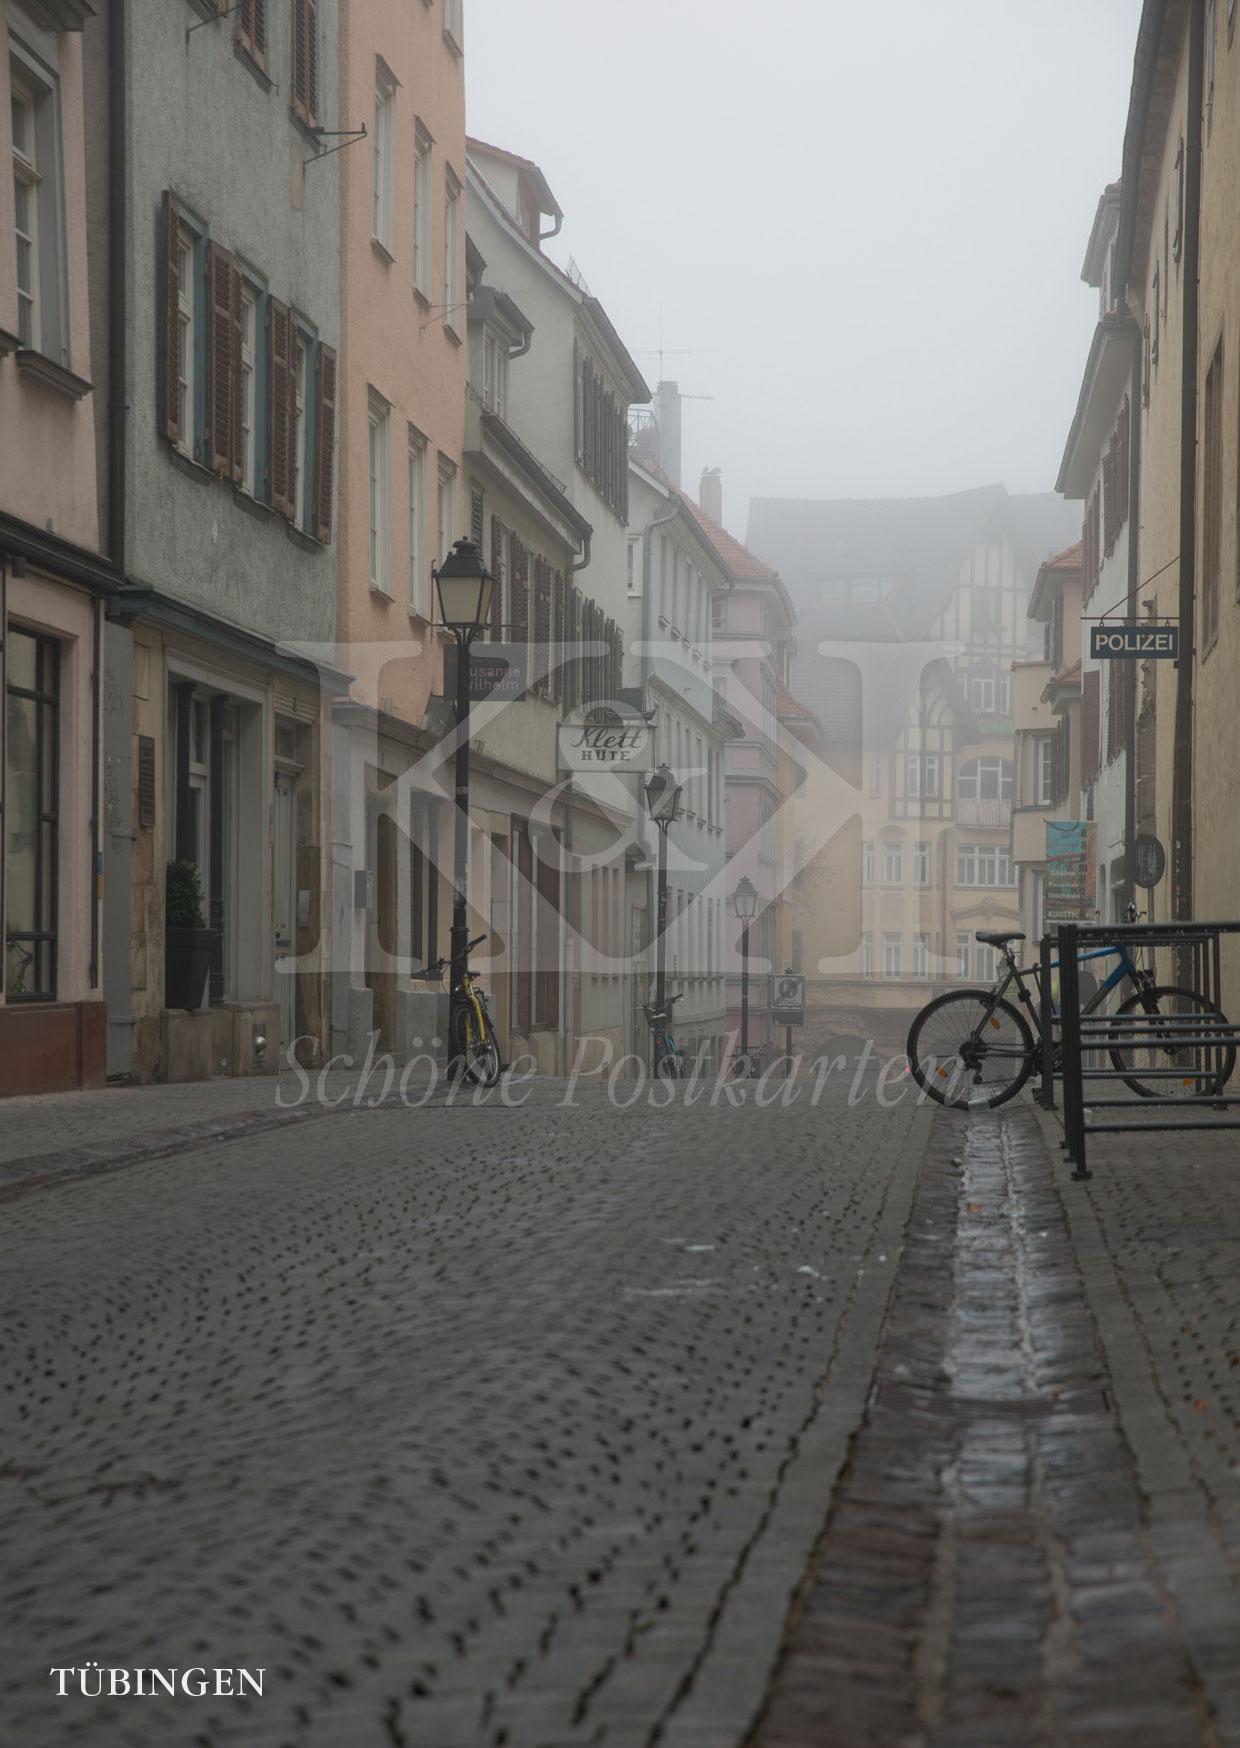 <strong>Schöne Postkarte Nr. 96</strong> · Tübingen, Pfleghof · © 2017